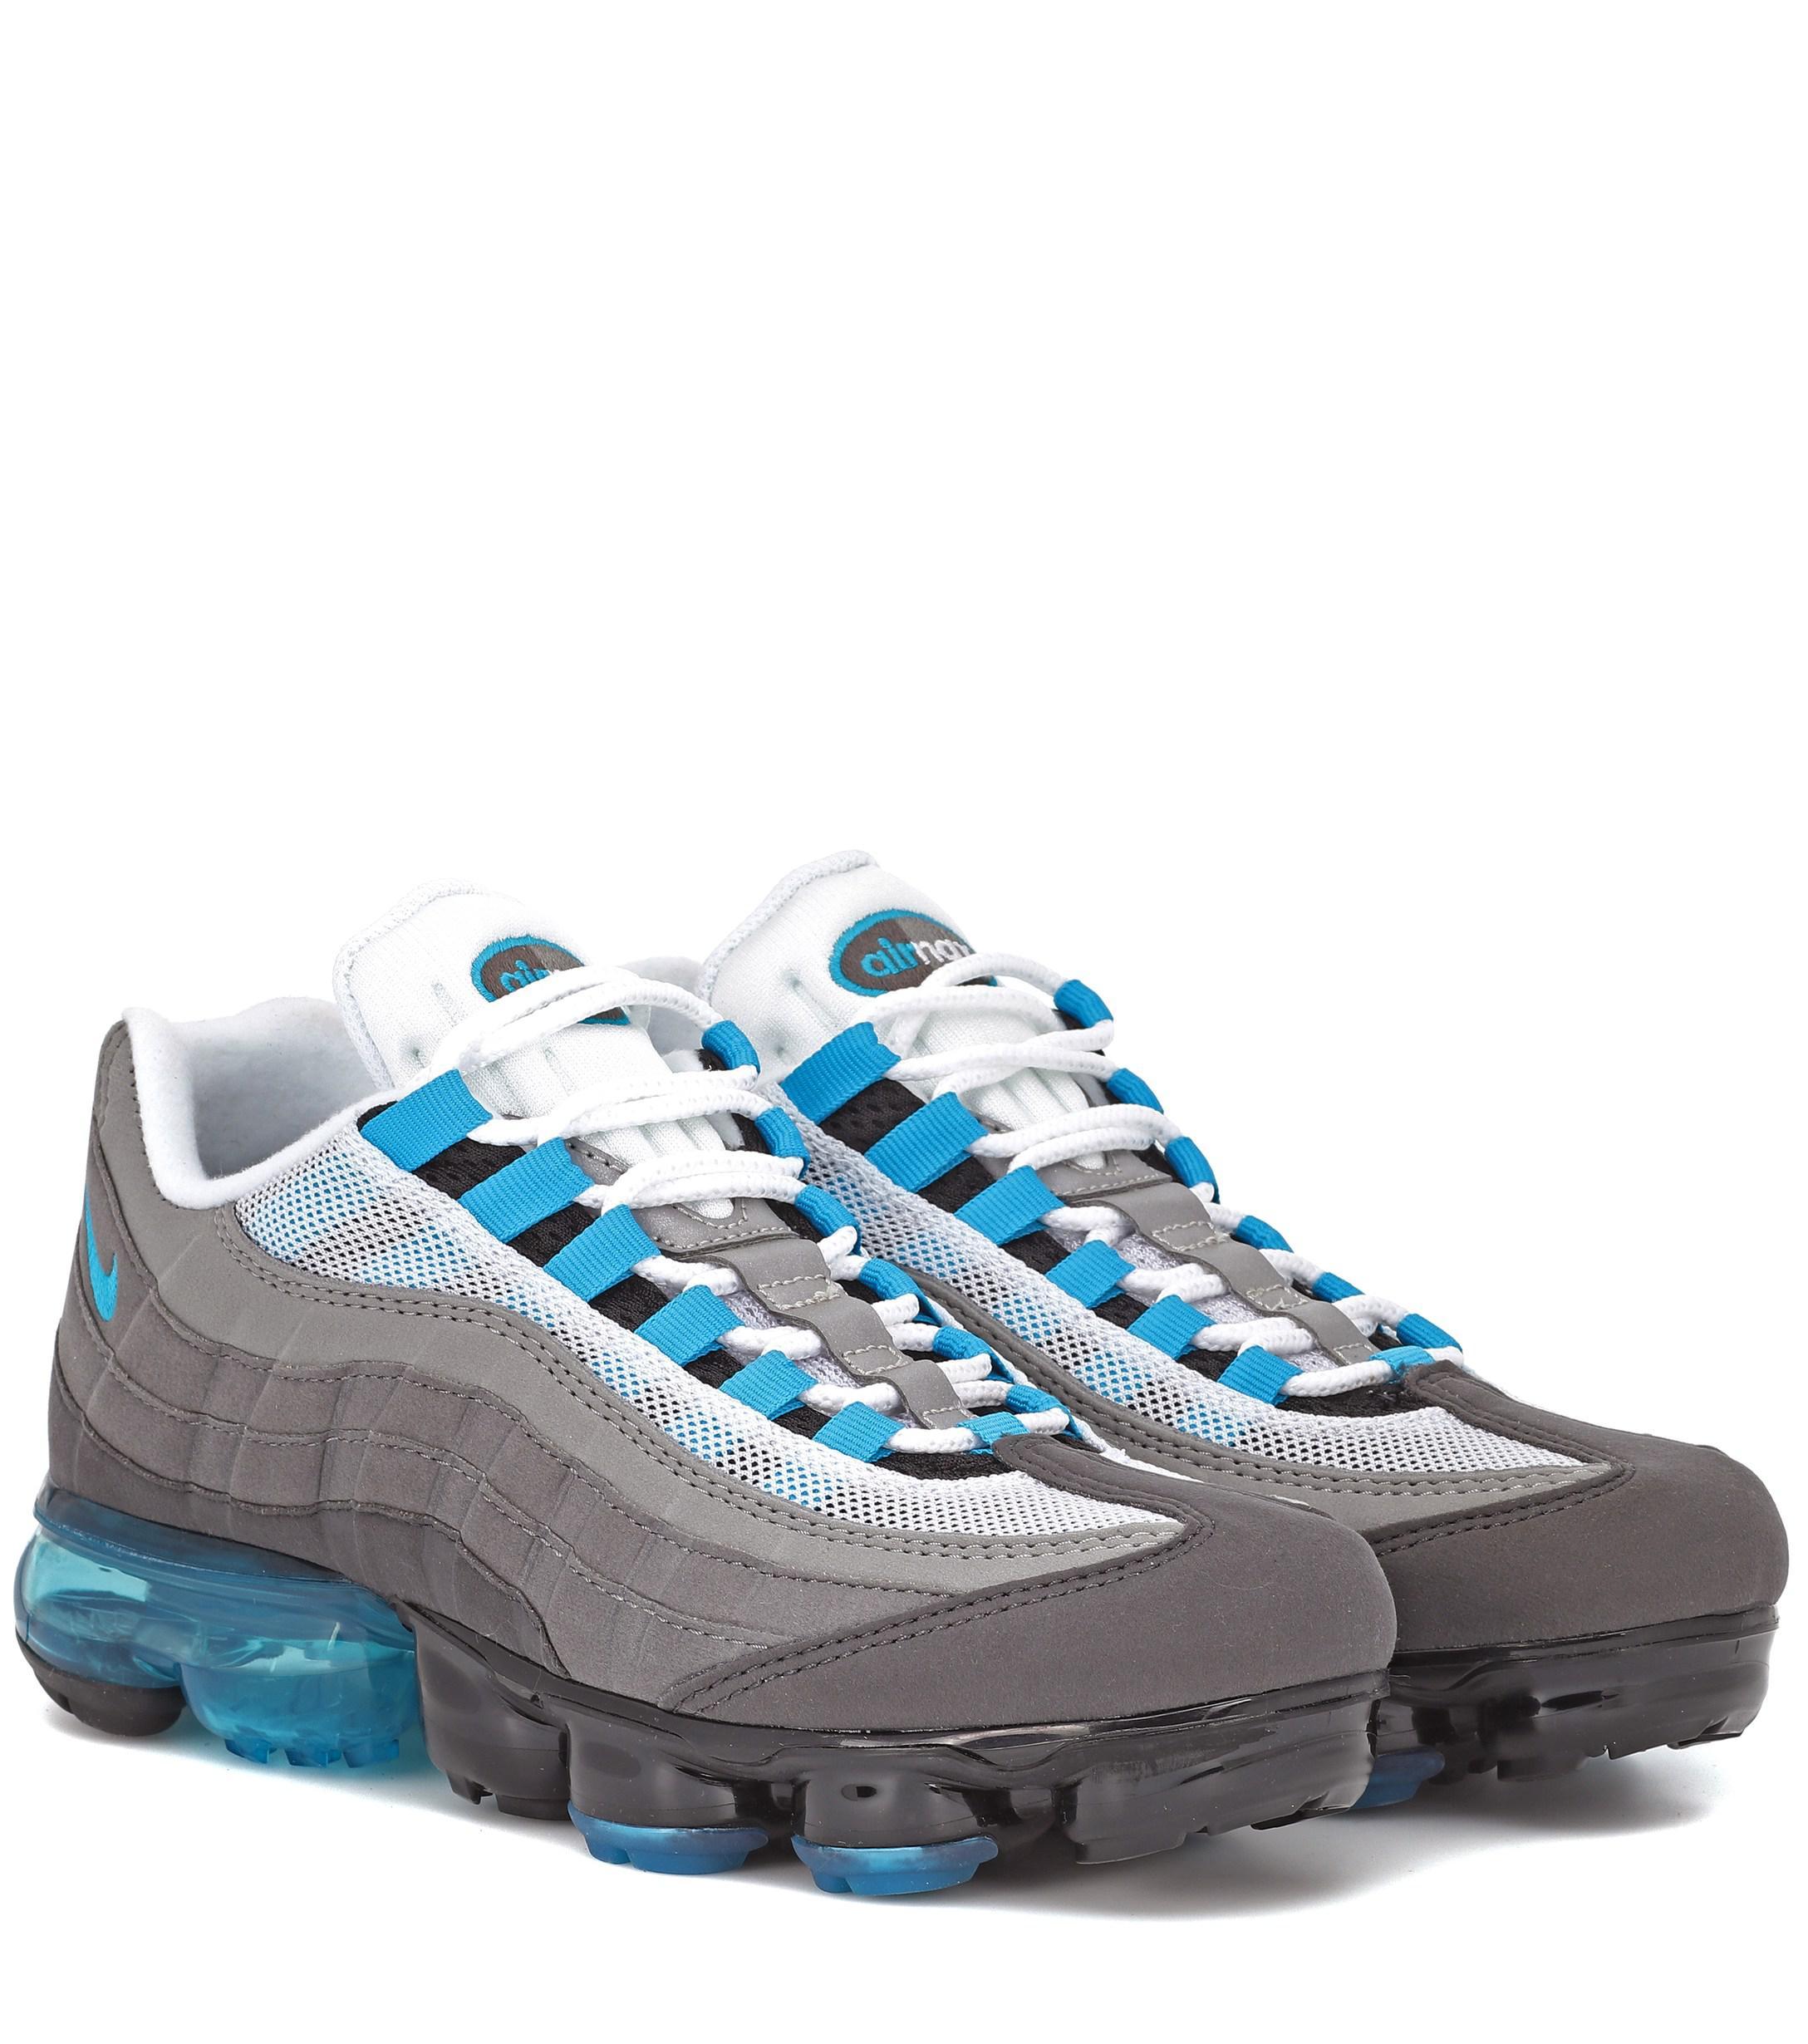 Nike Air Vapormax 95 Sneakers - Lyst